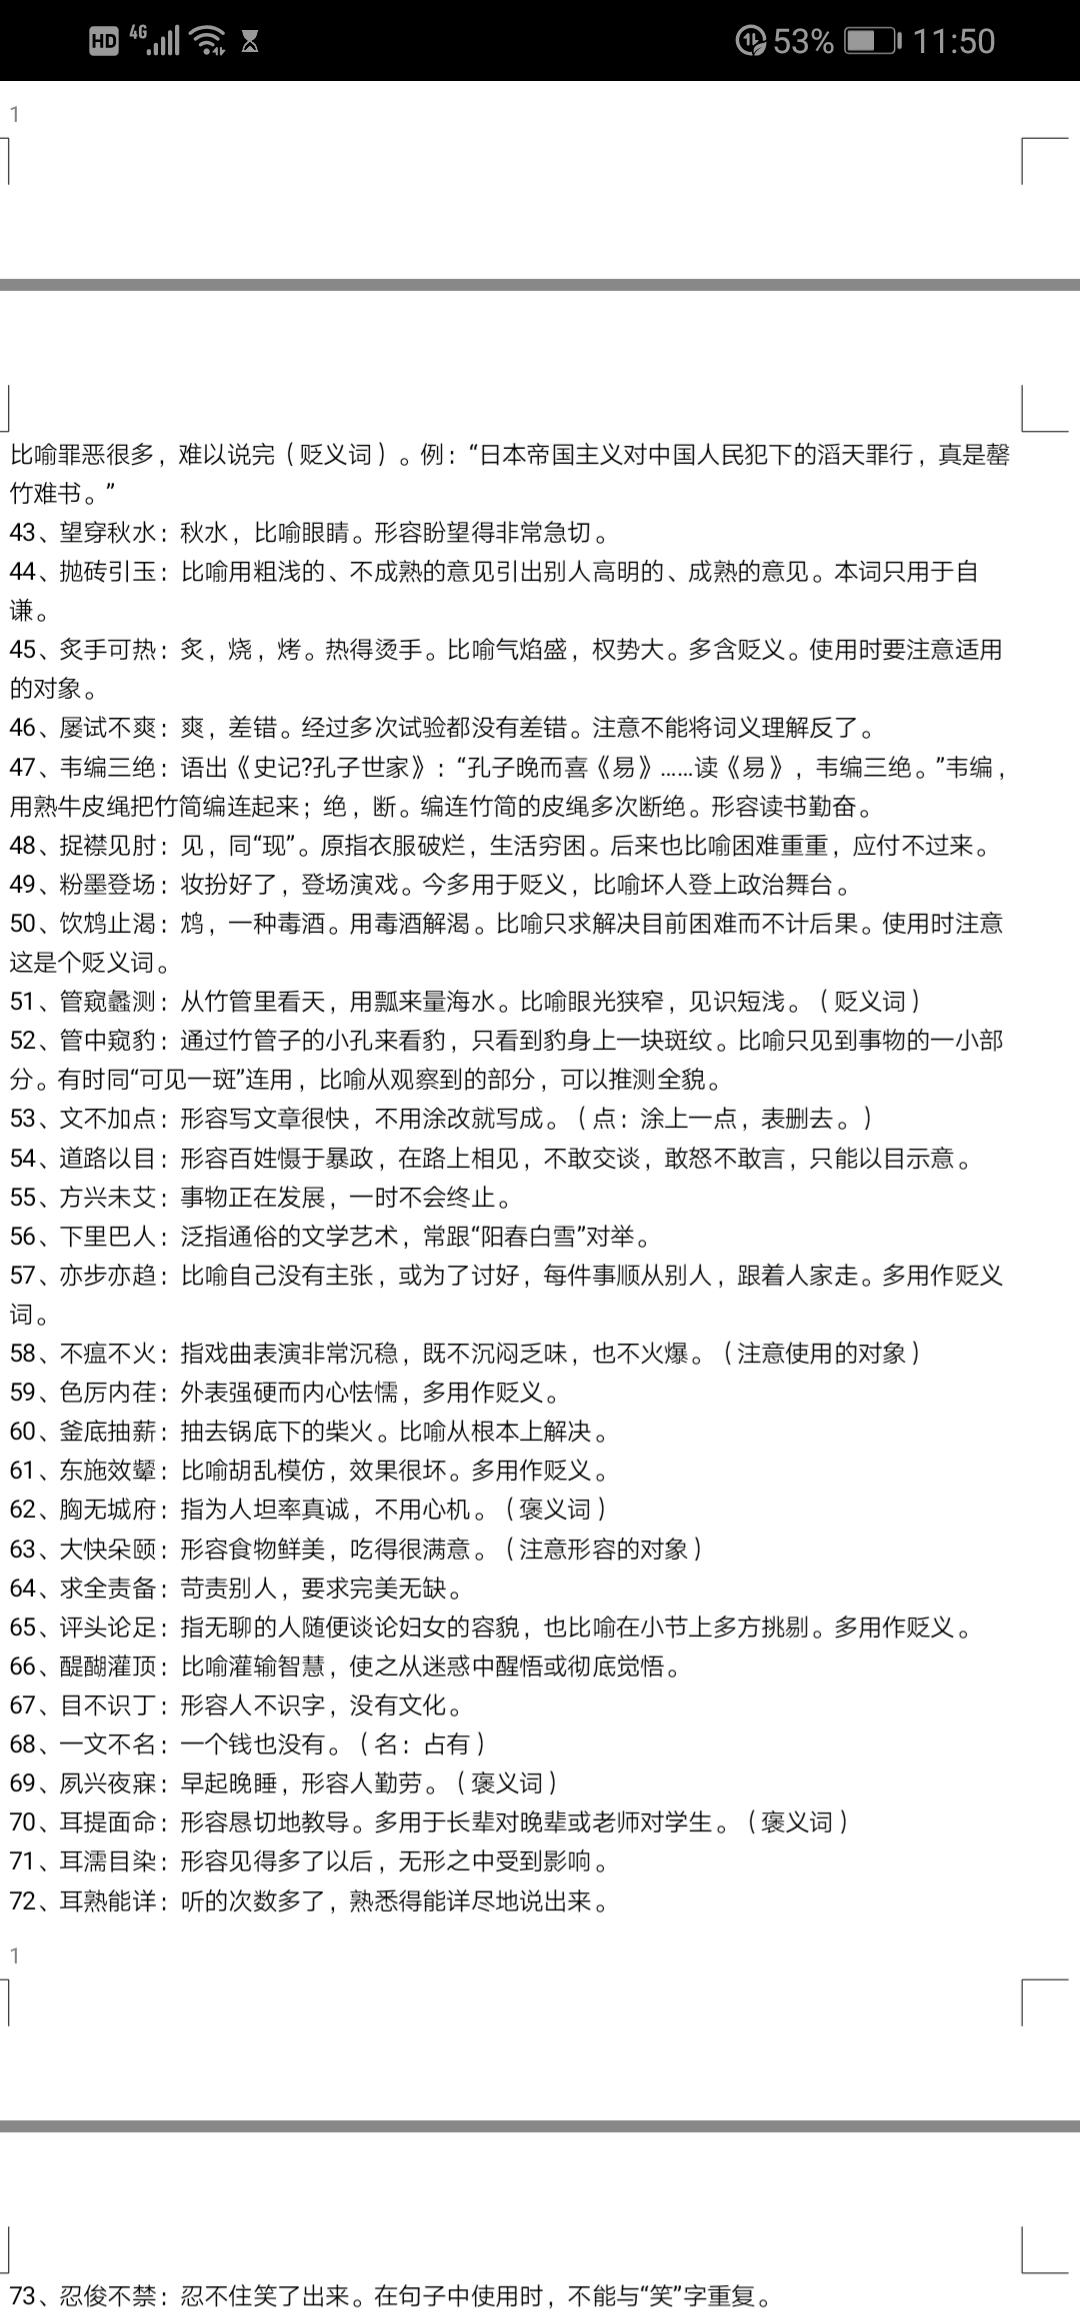 Screenshot_20190727_115043_com.tencent.mm.jpg